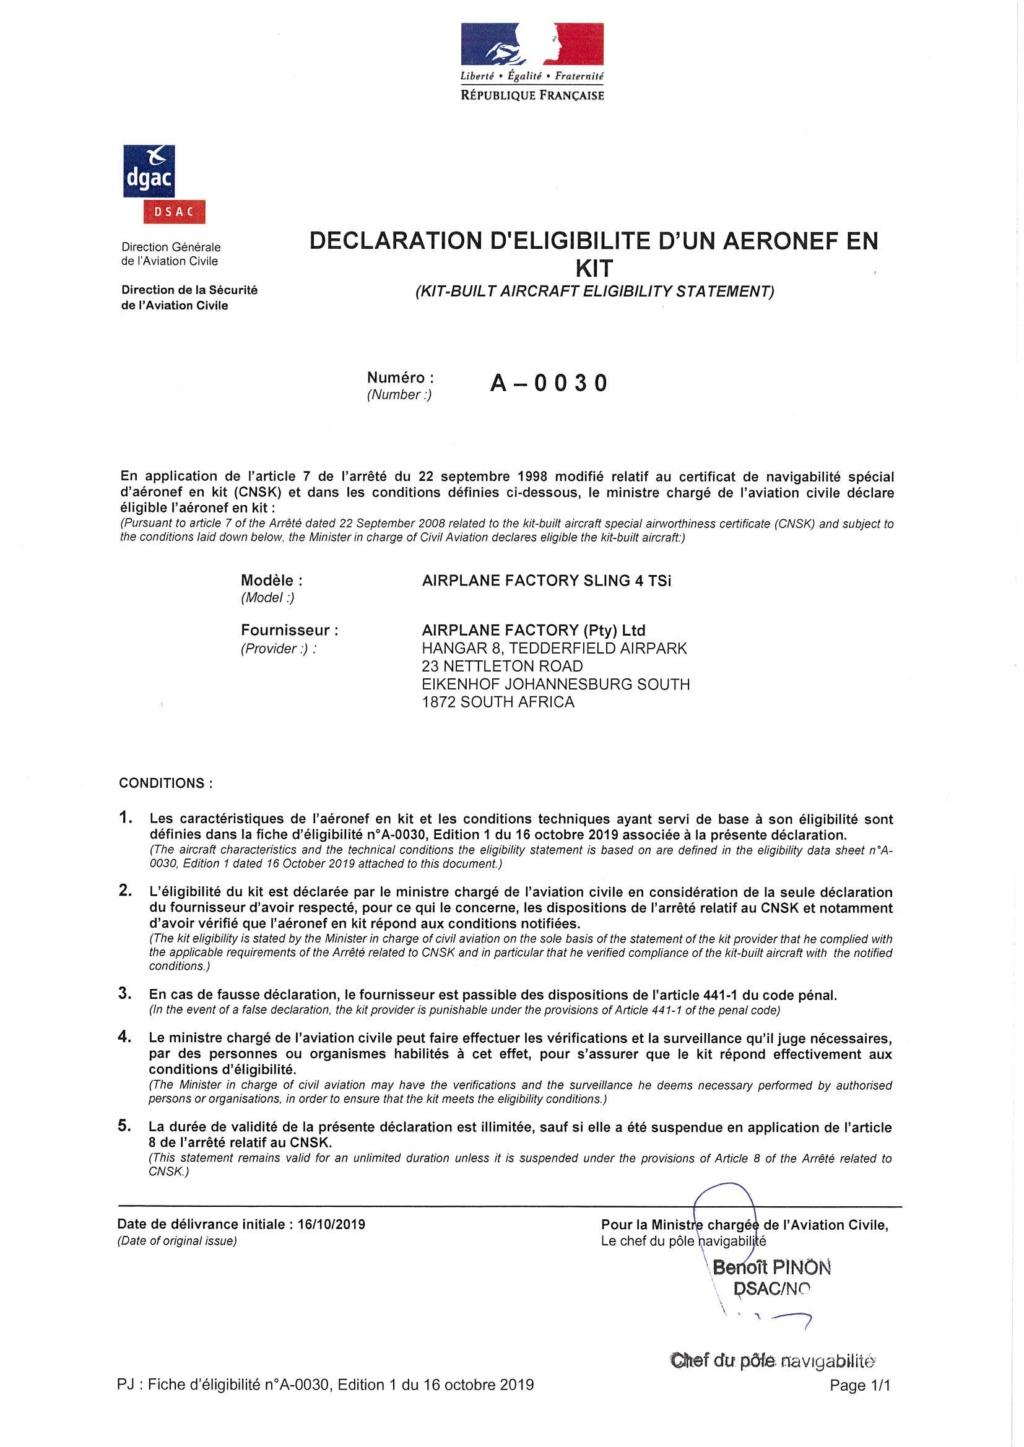 Sling 4 TSi Déclaration d'éligibilité en kit A-0030 du 16 octobre2019 19101610